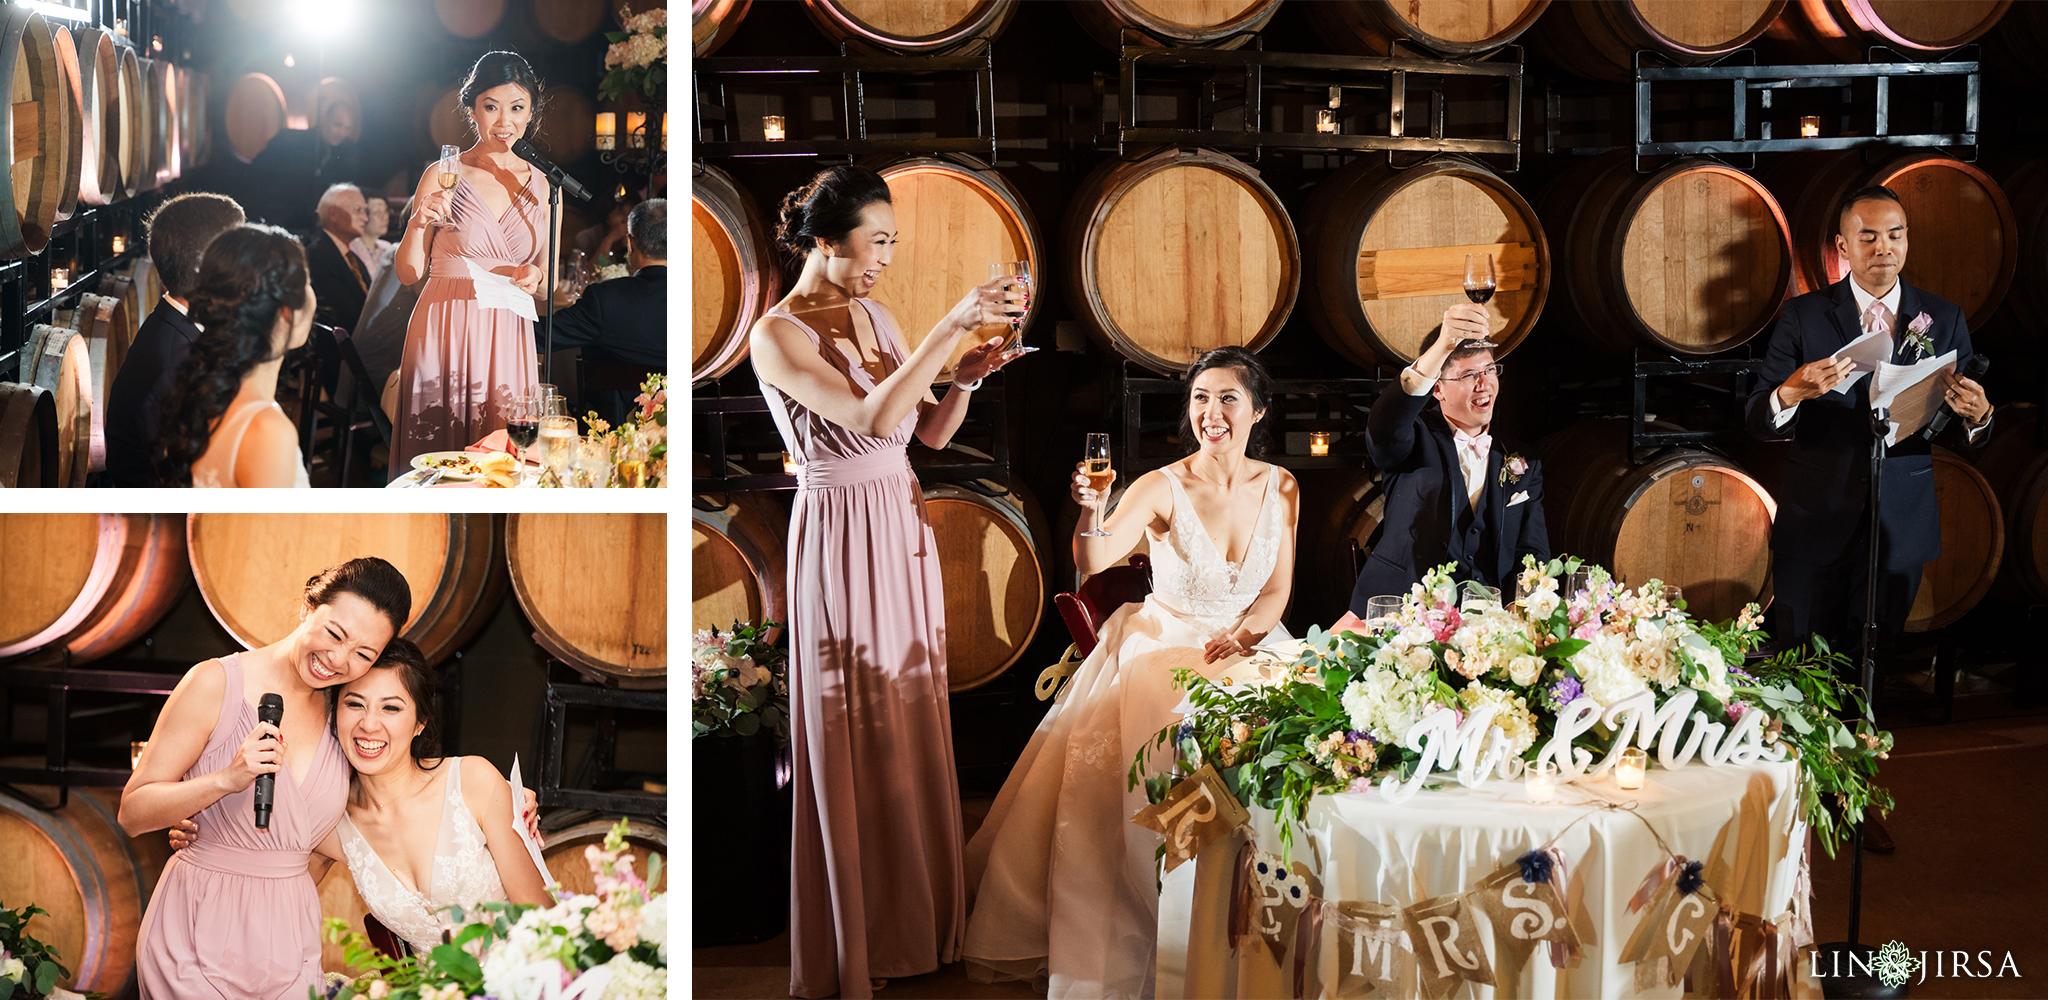 42 Leoness Cellars Temecula Wedding Photography